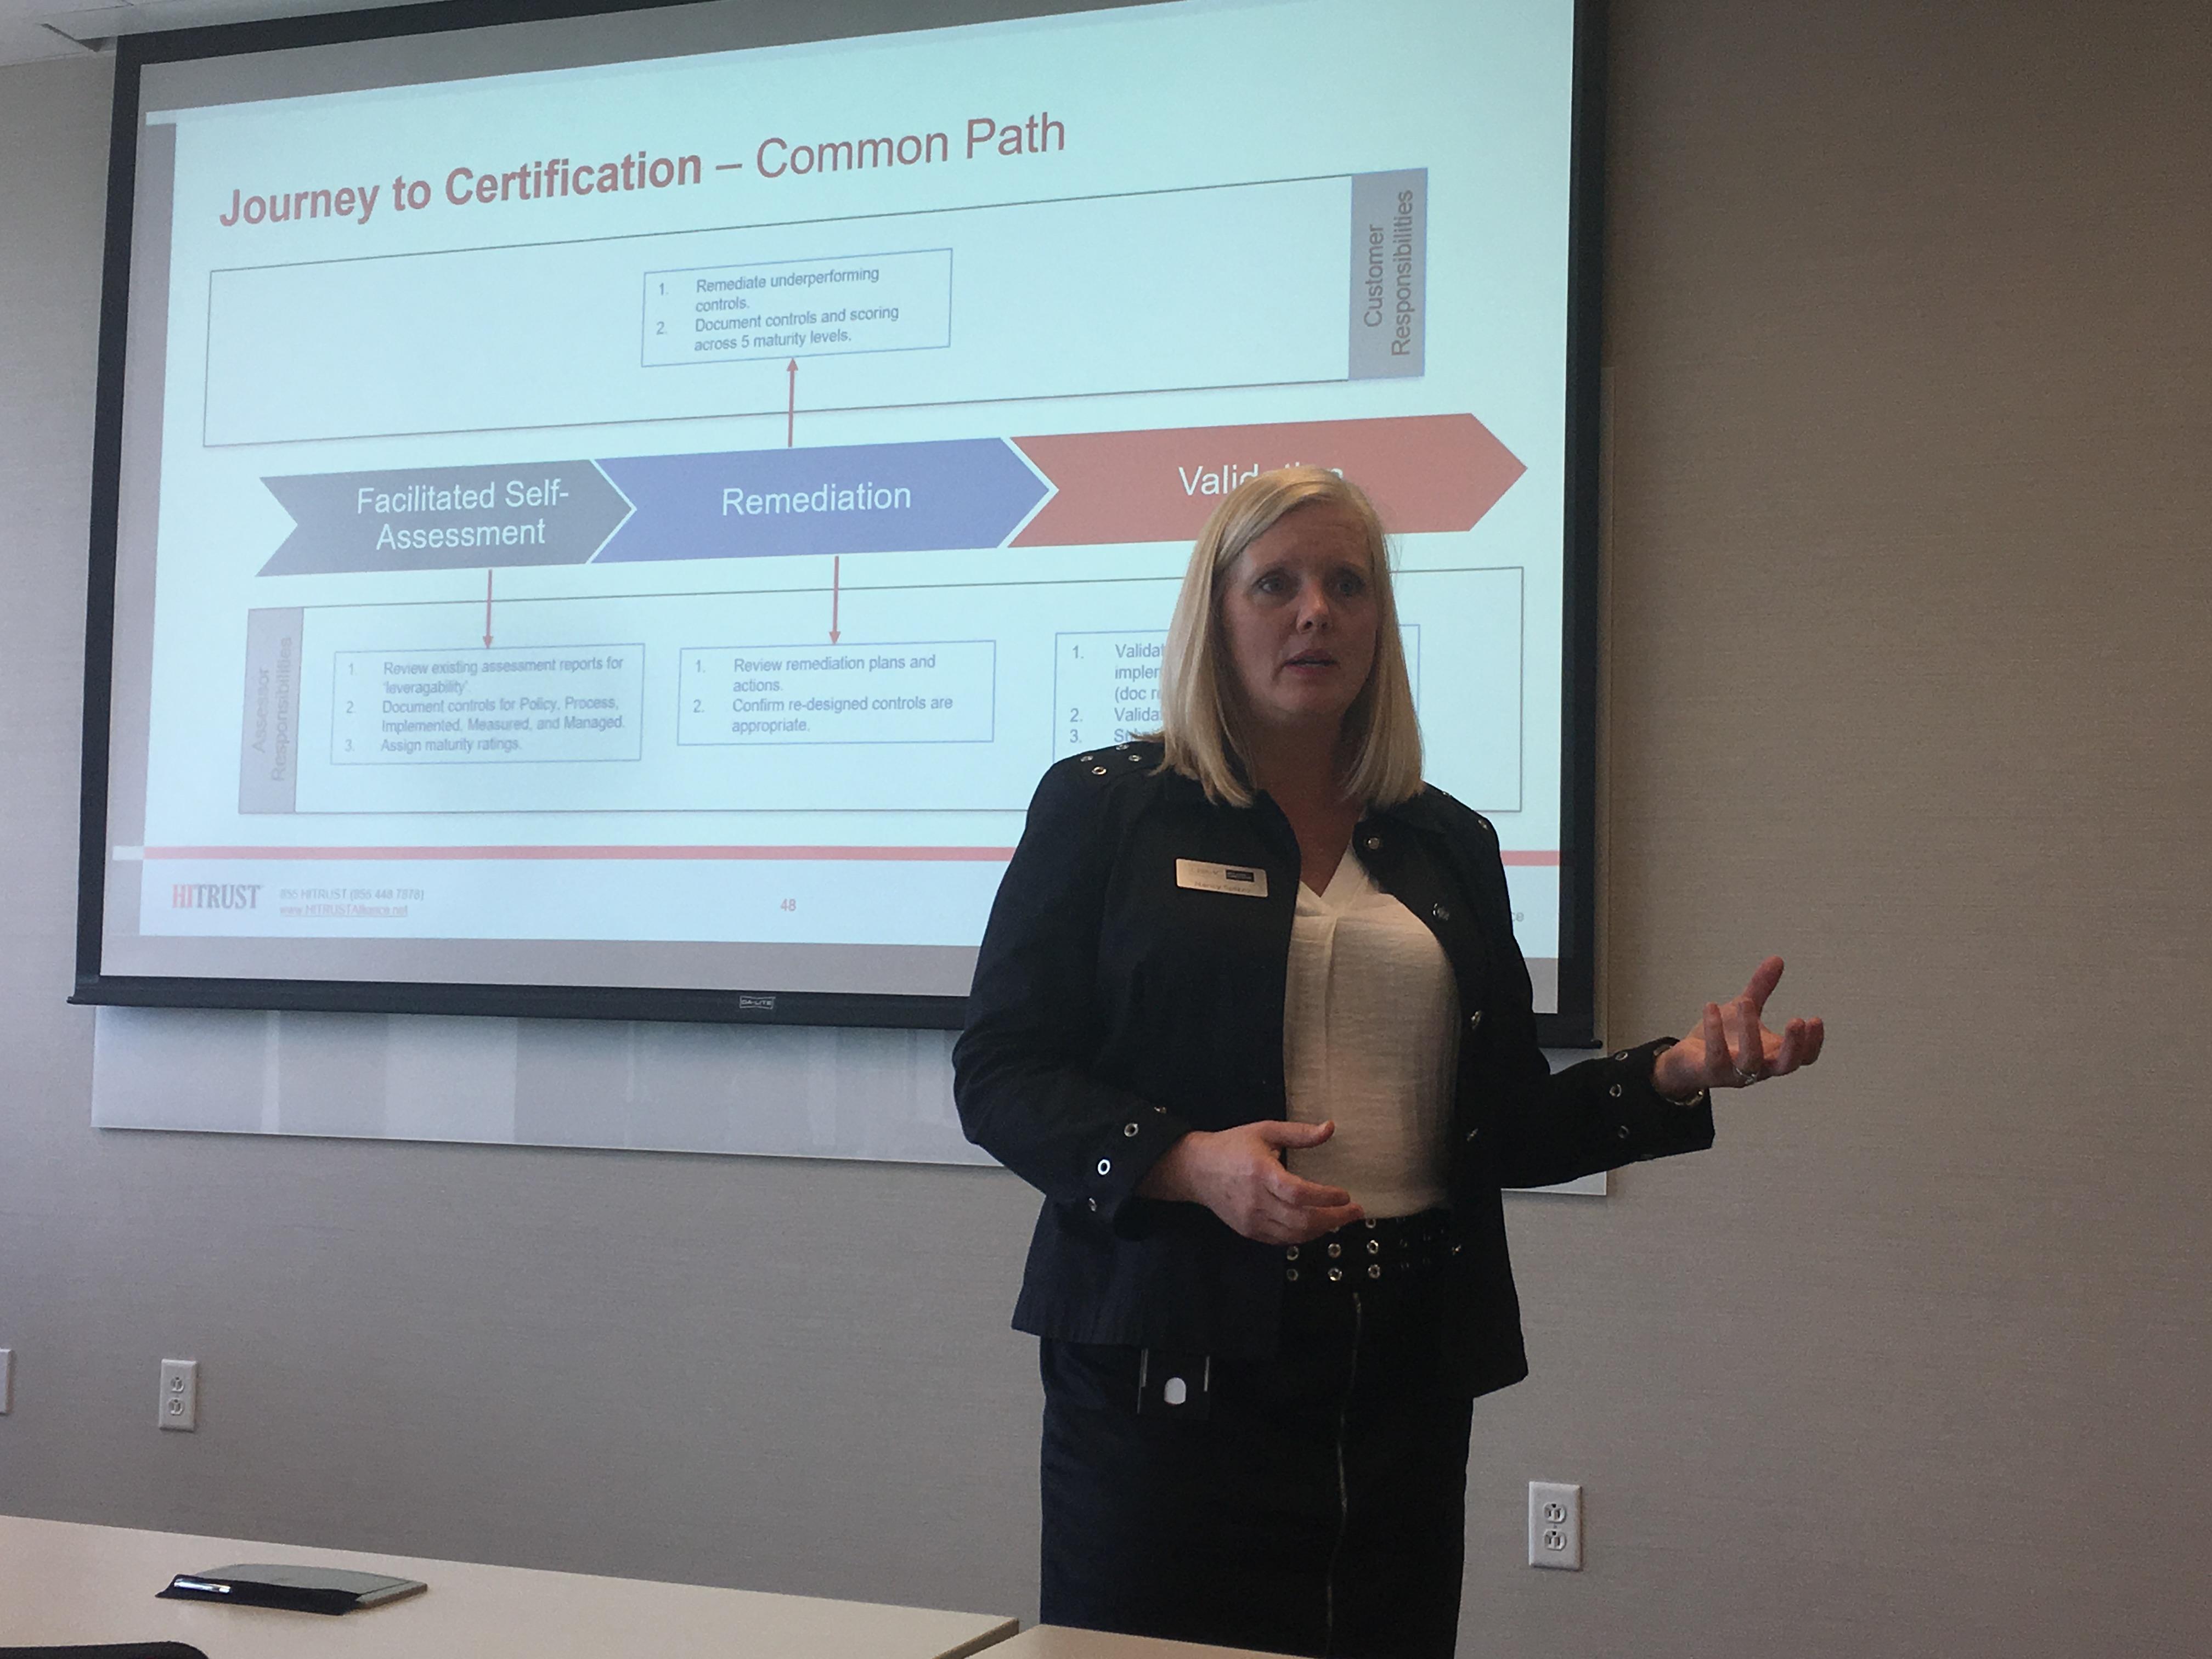 HITRUST Community Extension Program (CEP) in Nashville - Nancy Spizzo (LBMC)